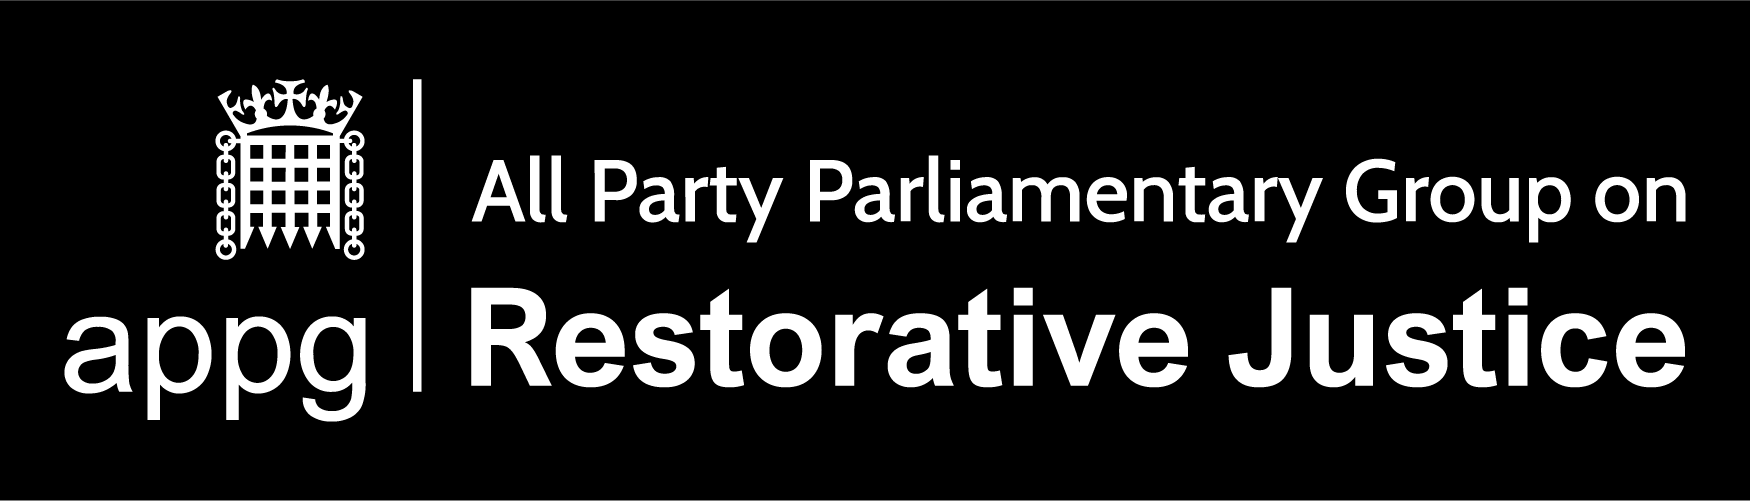 Restorative Justice Appg Logo